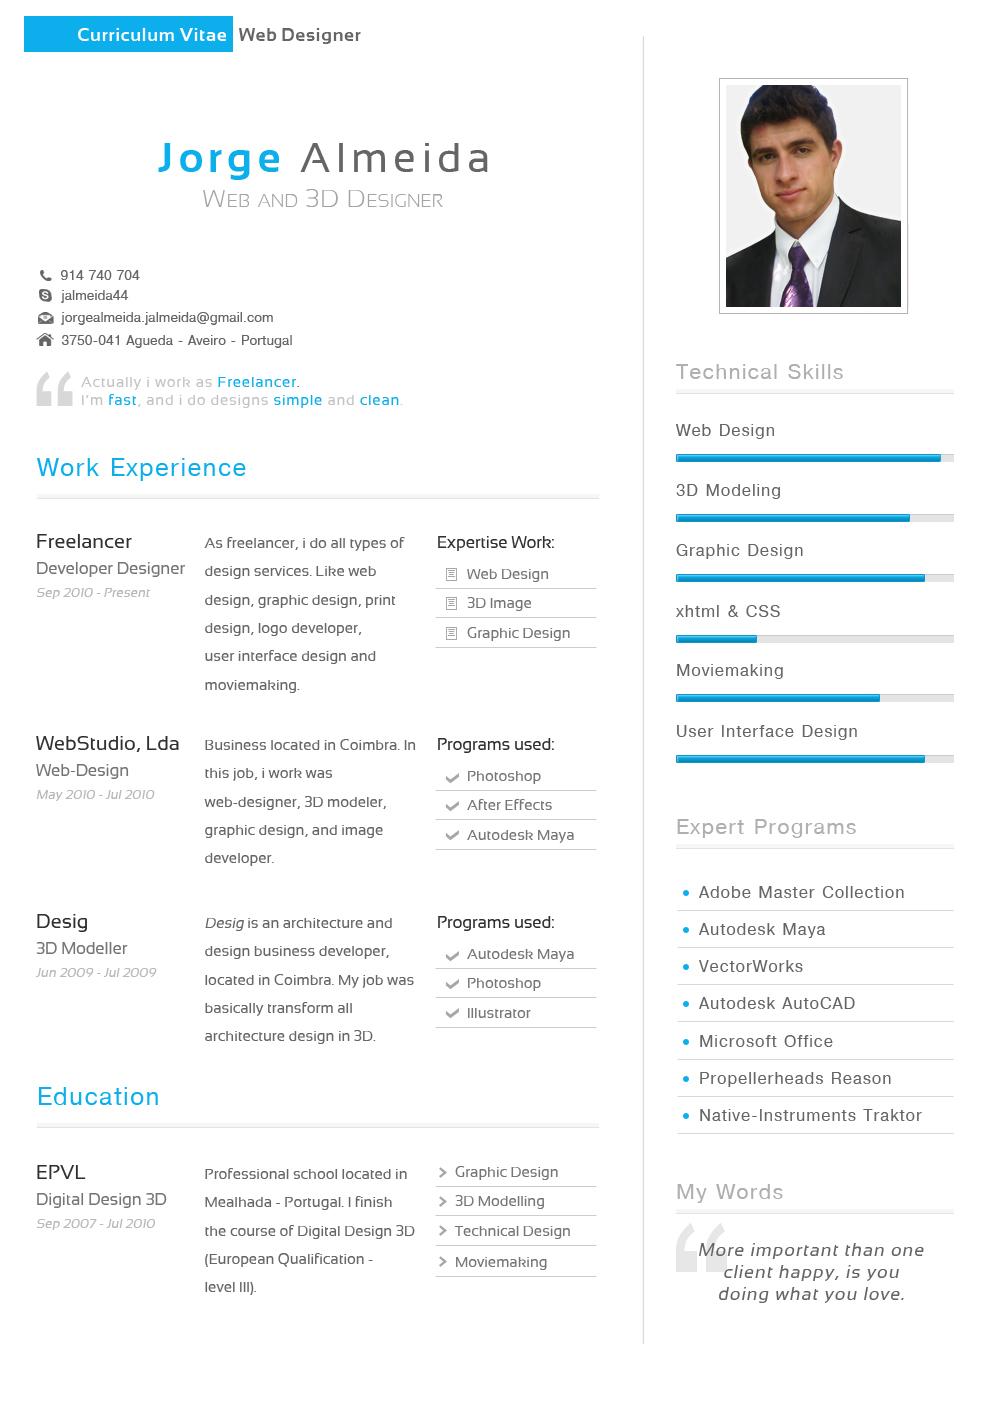 Curriculum Vitae - Jorge Almeida by TheDpStudio on DeviantArt